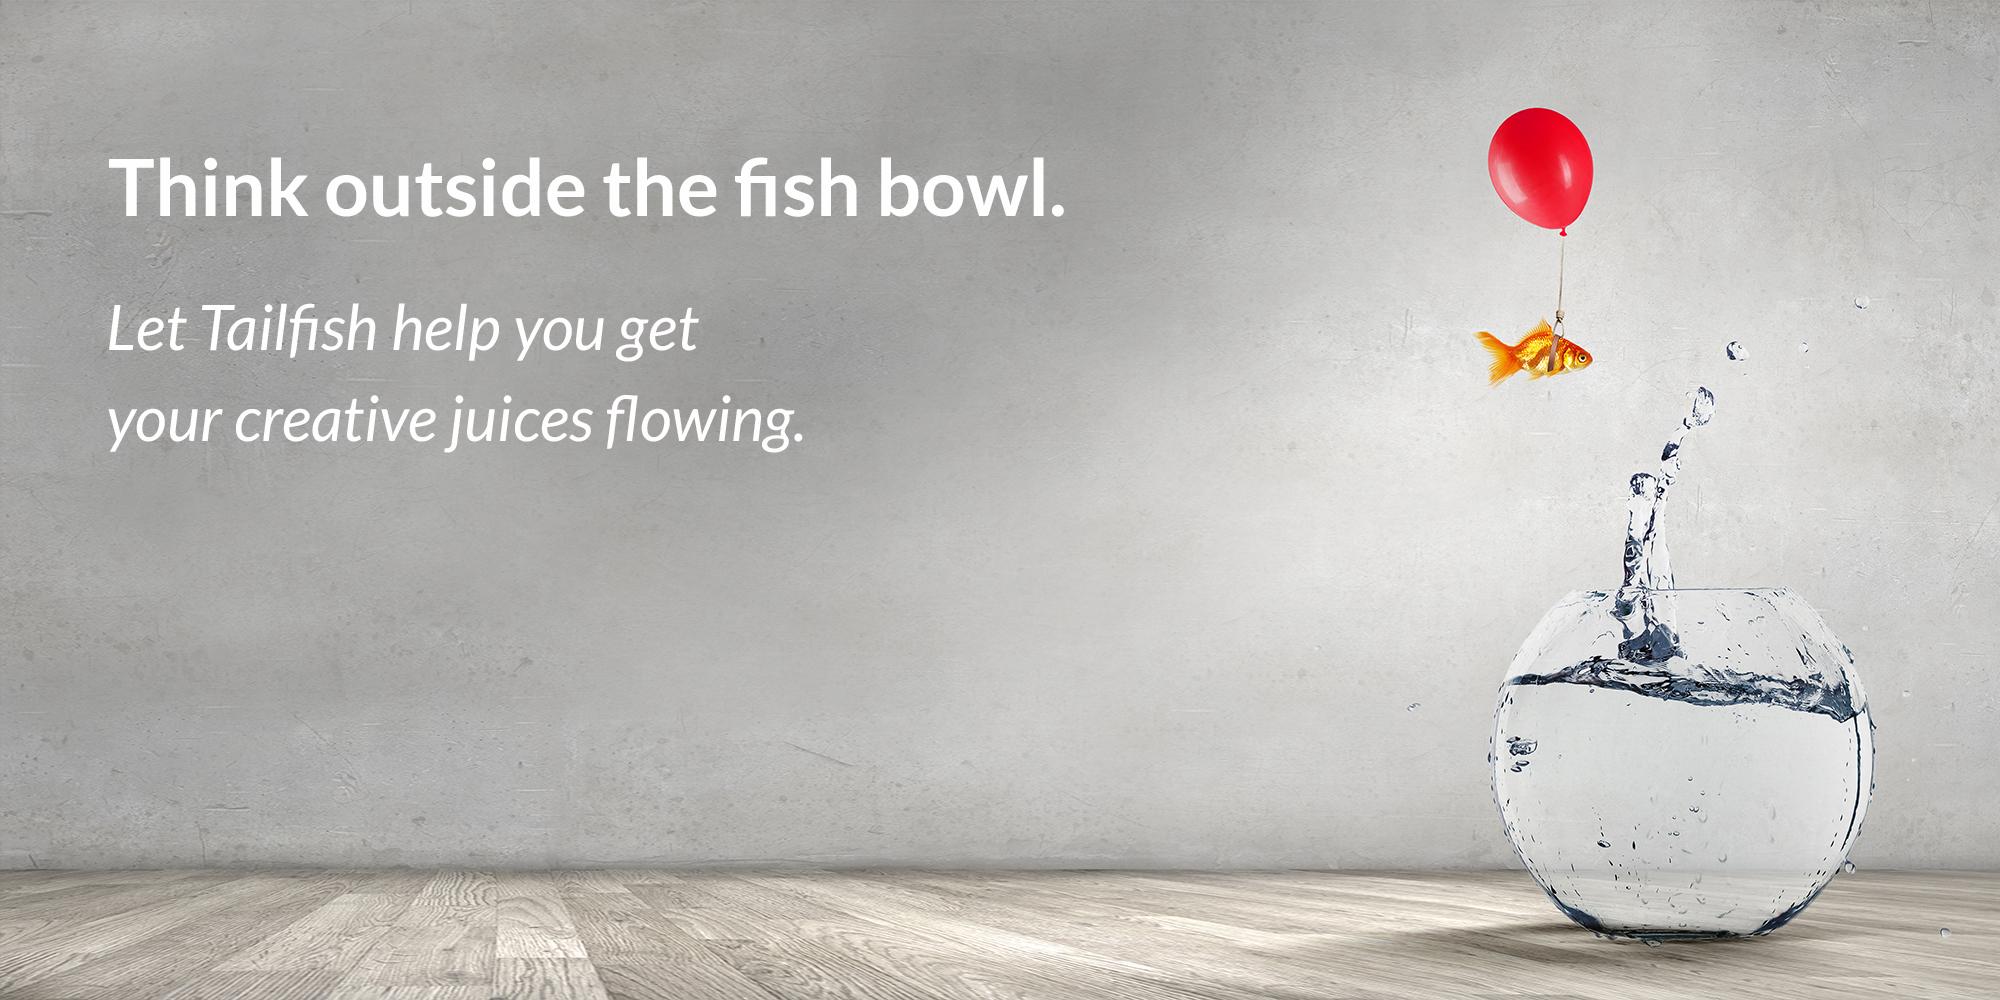 fishbowl-2